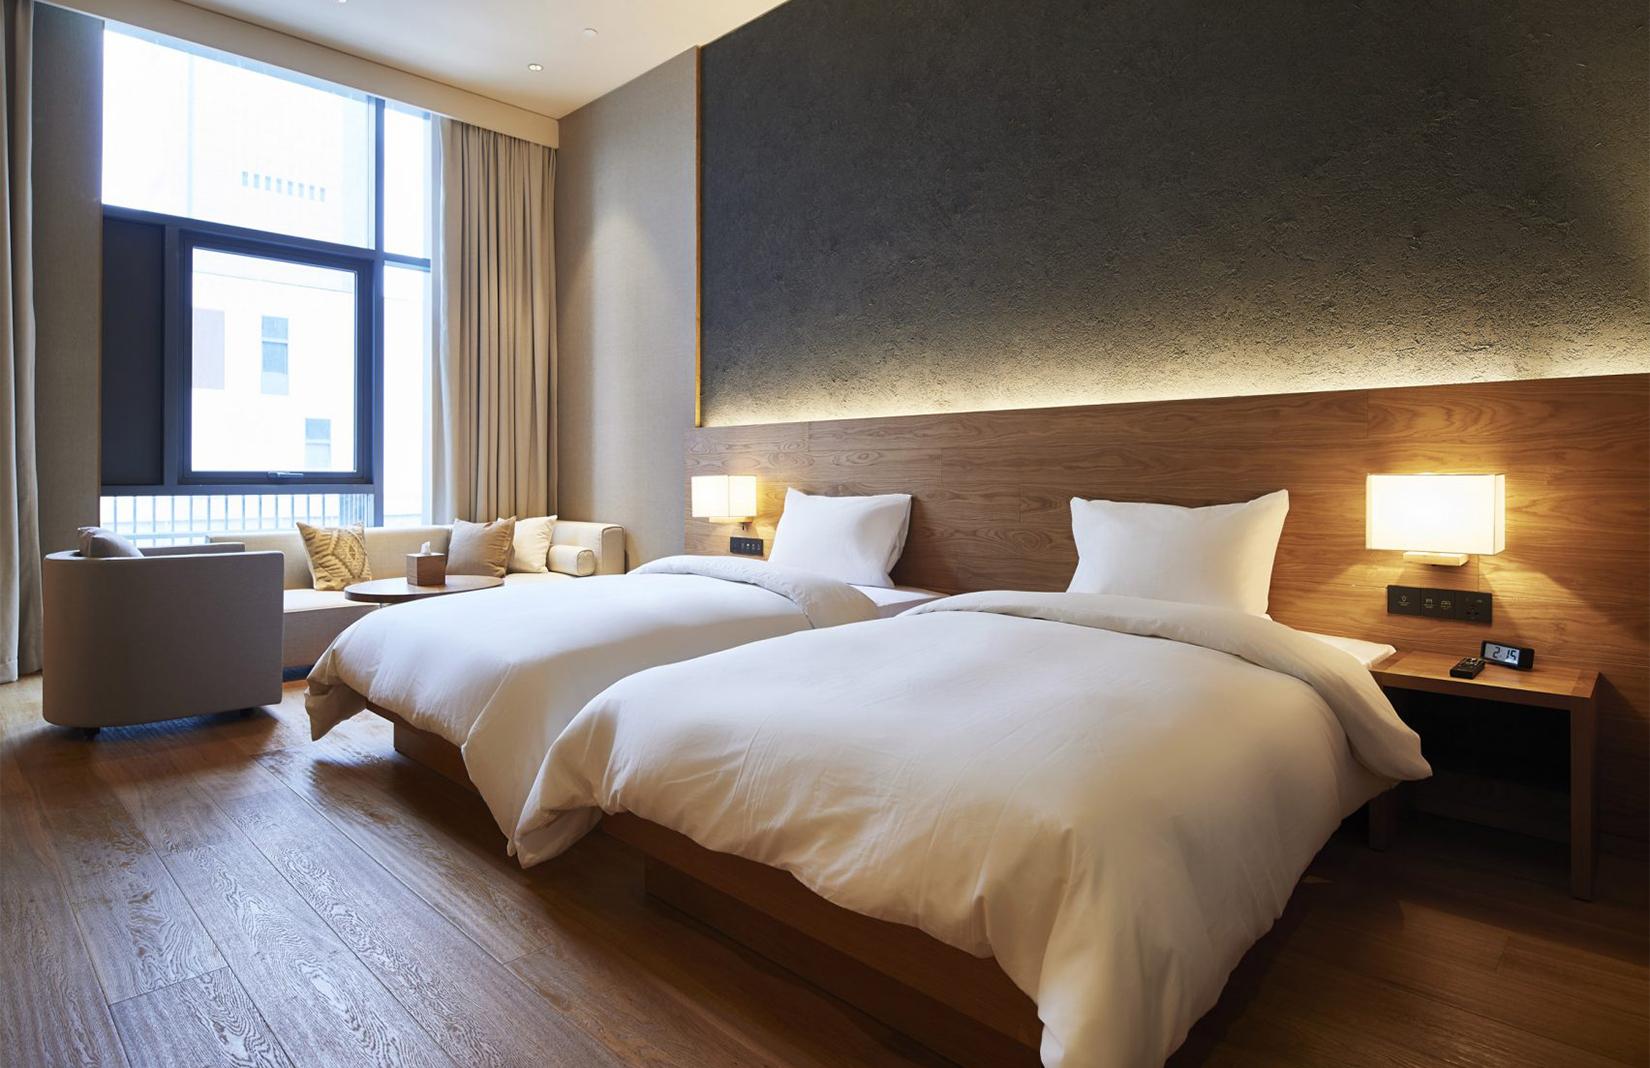 muji-hotel-shenzhen-room-homepage